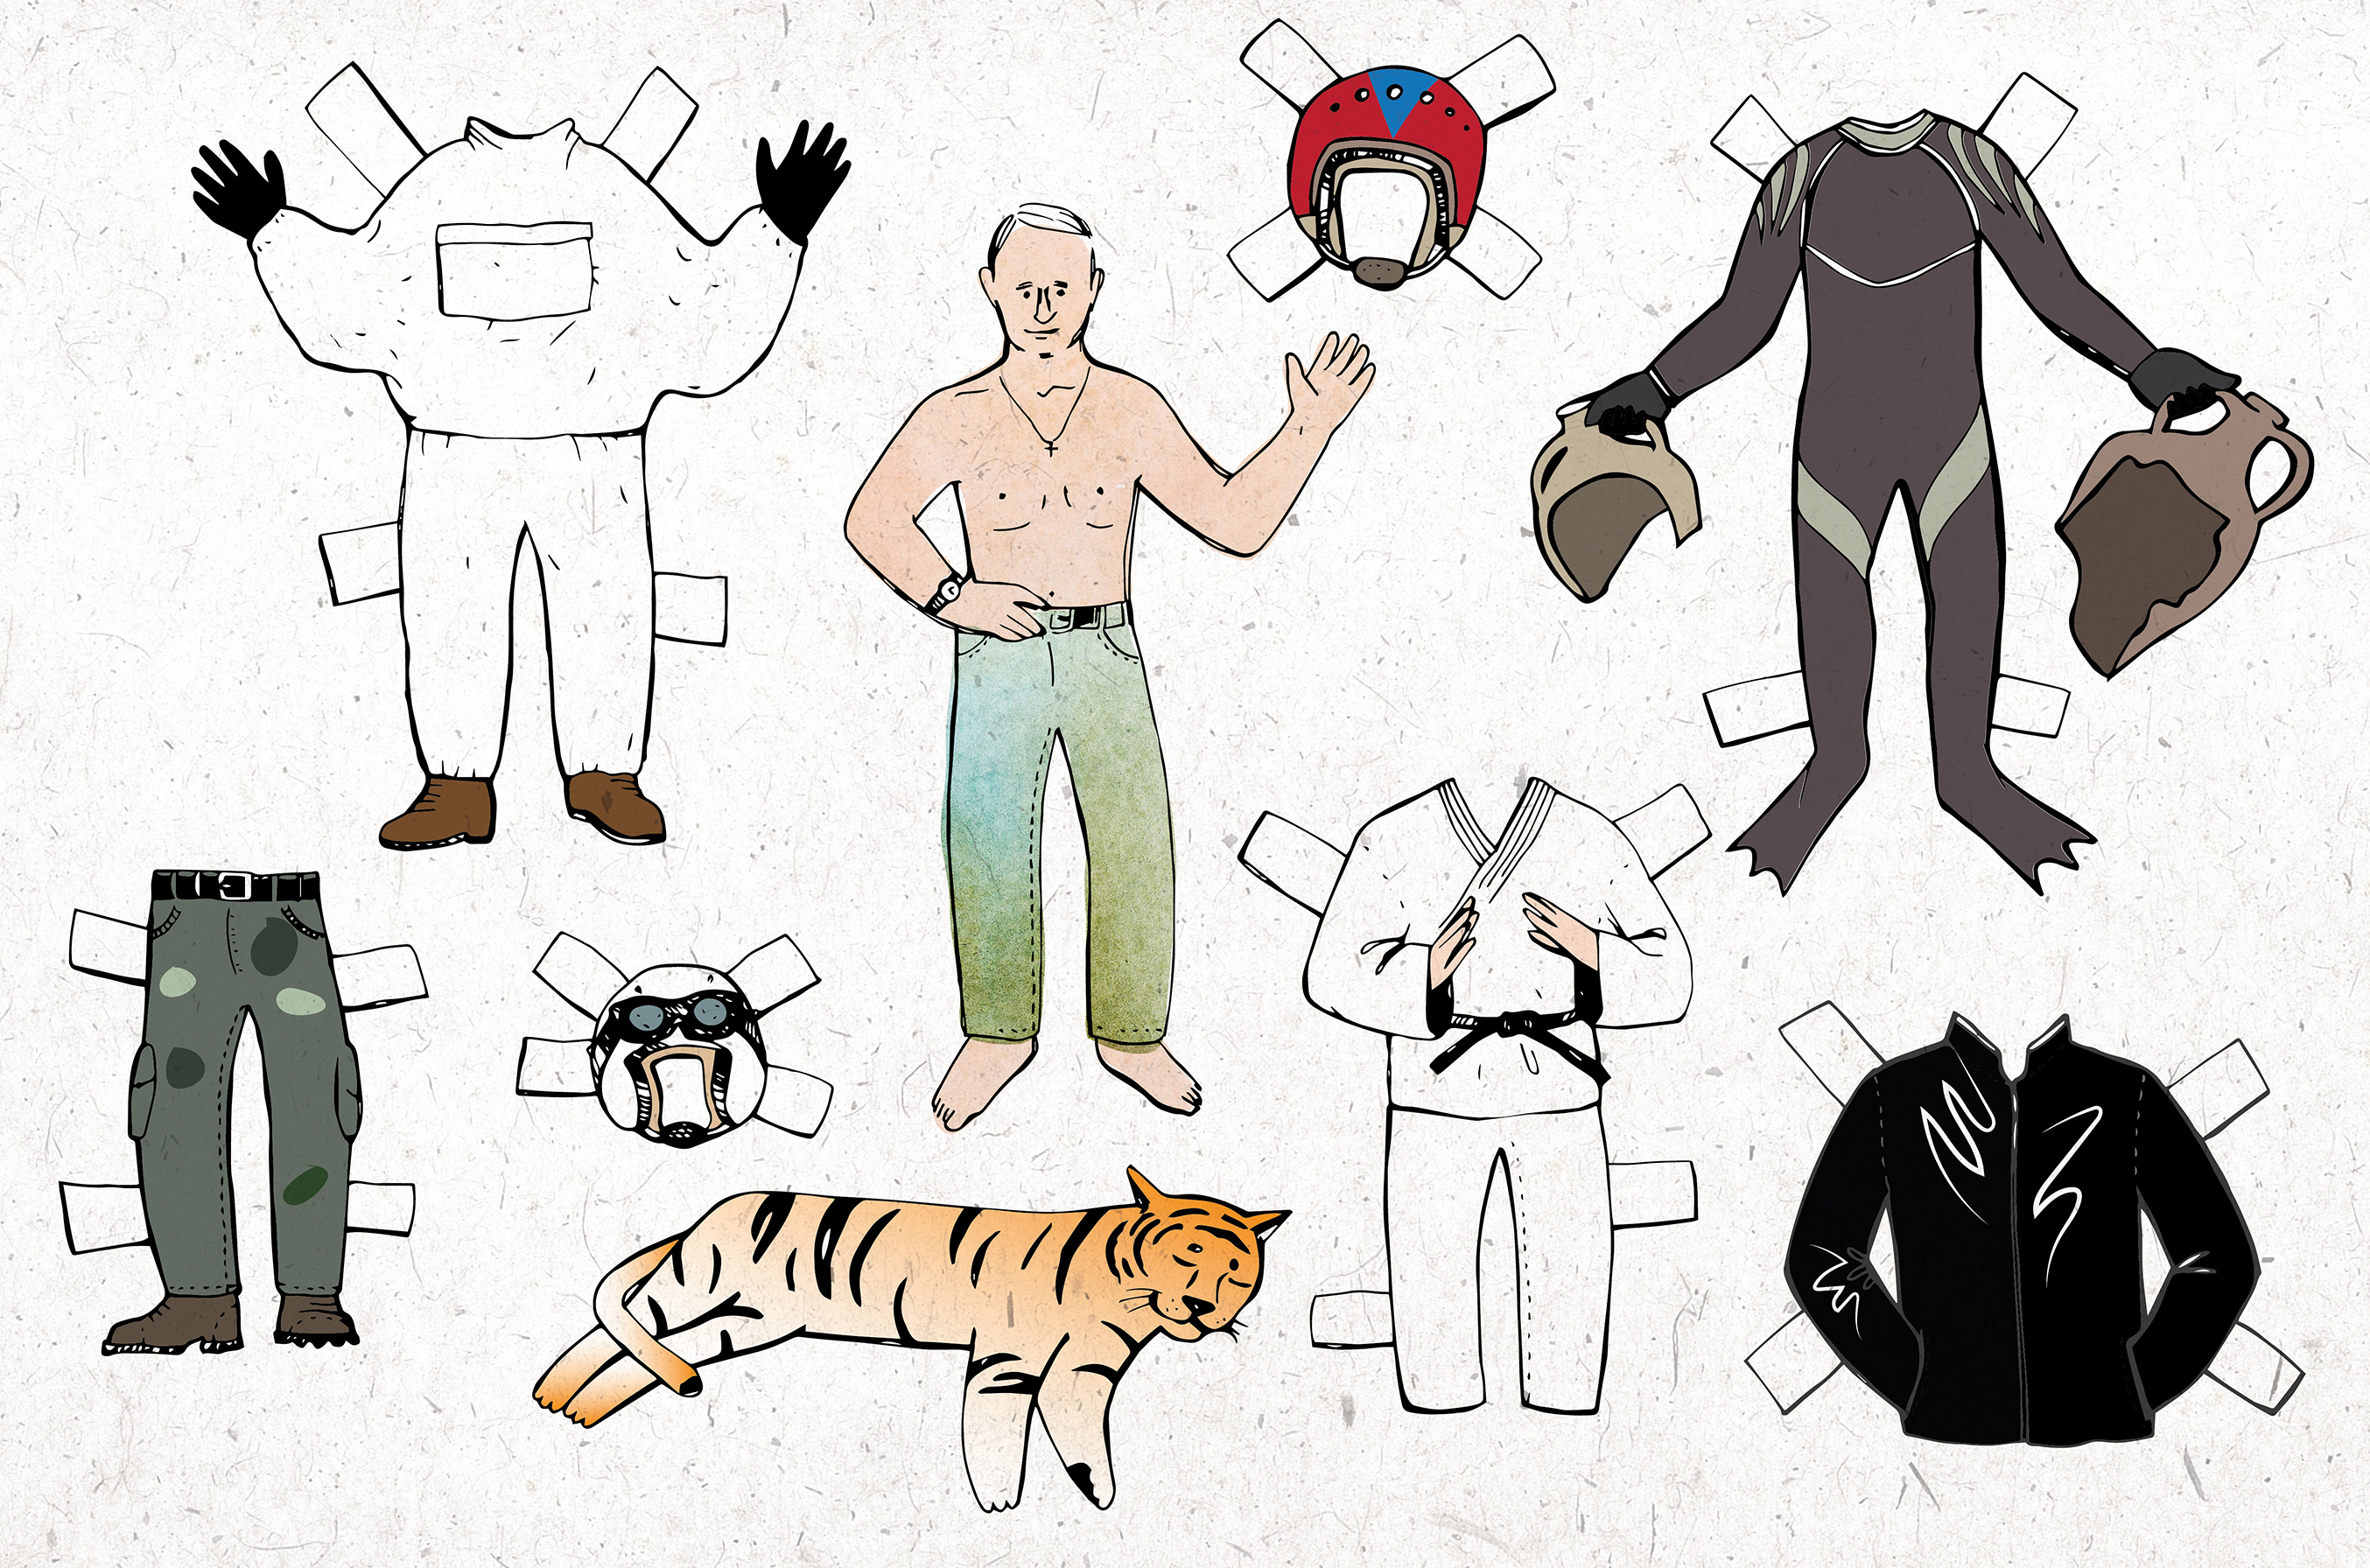 Kenapa Putin Mencitrakan Dirinya Sebagai 'Pria Jantan'?